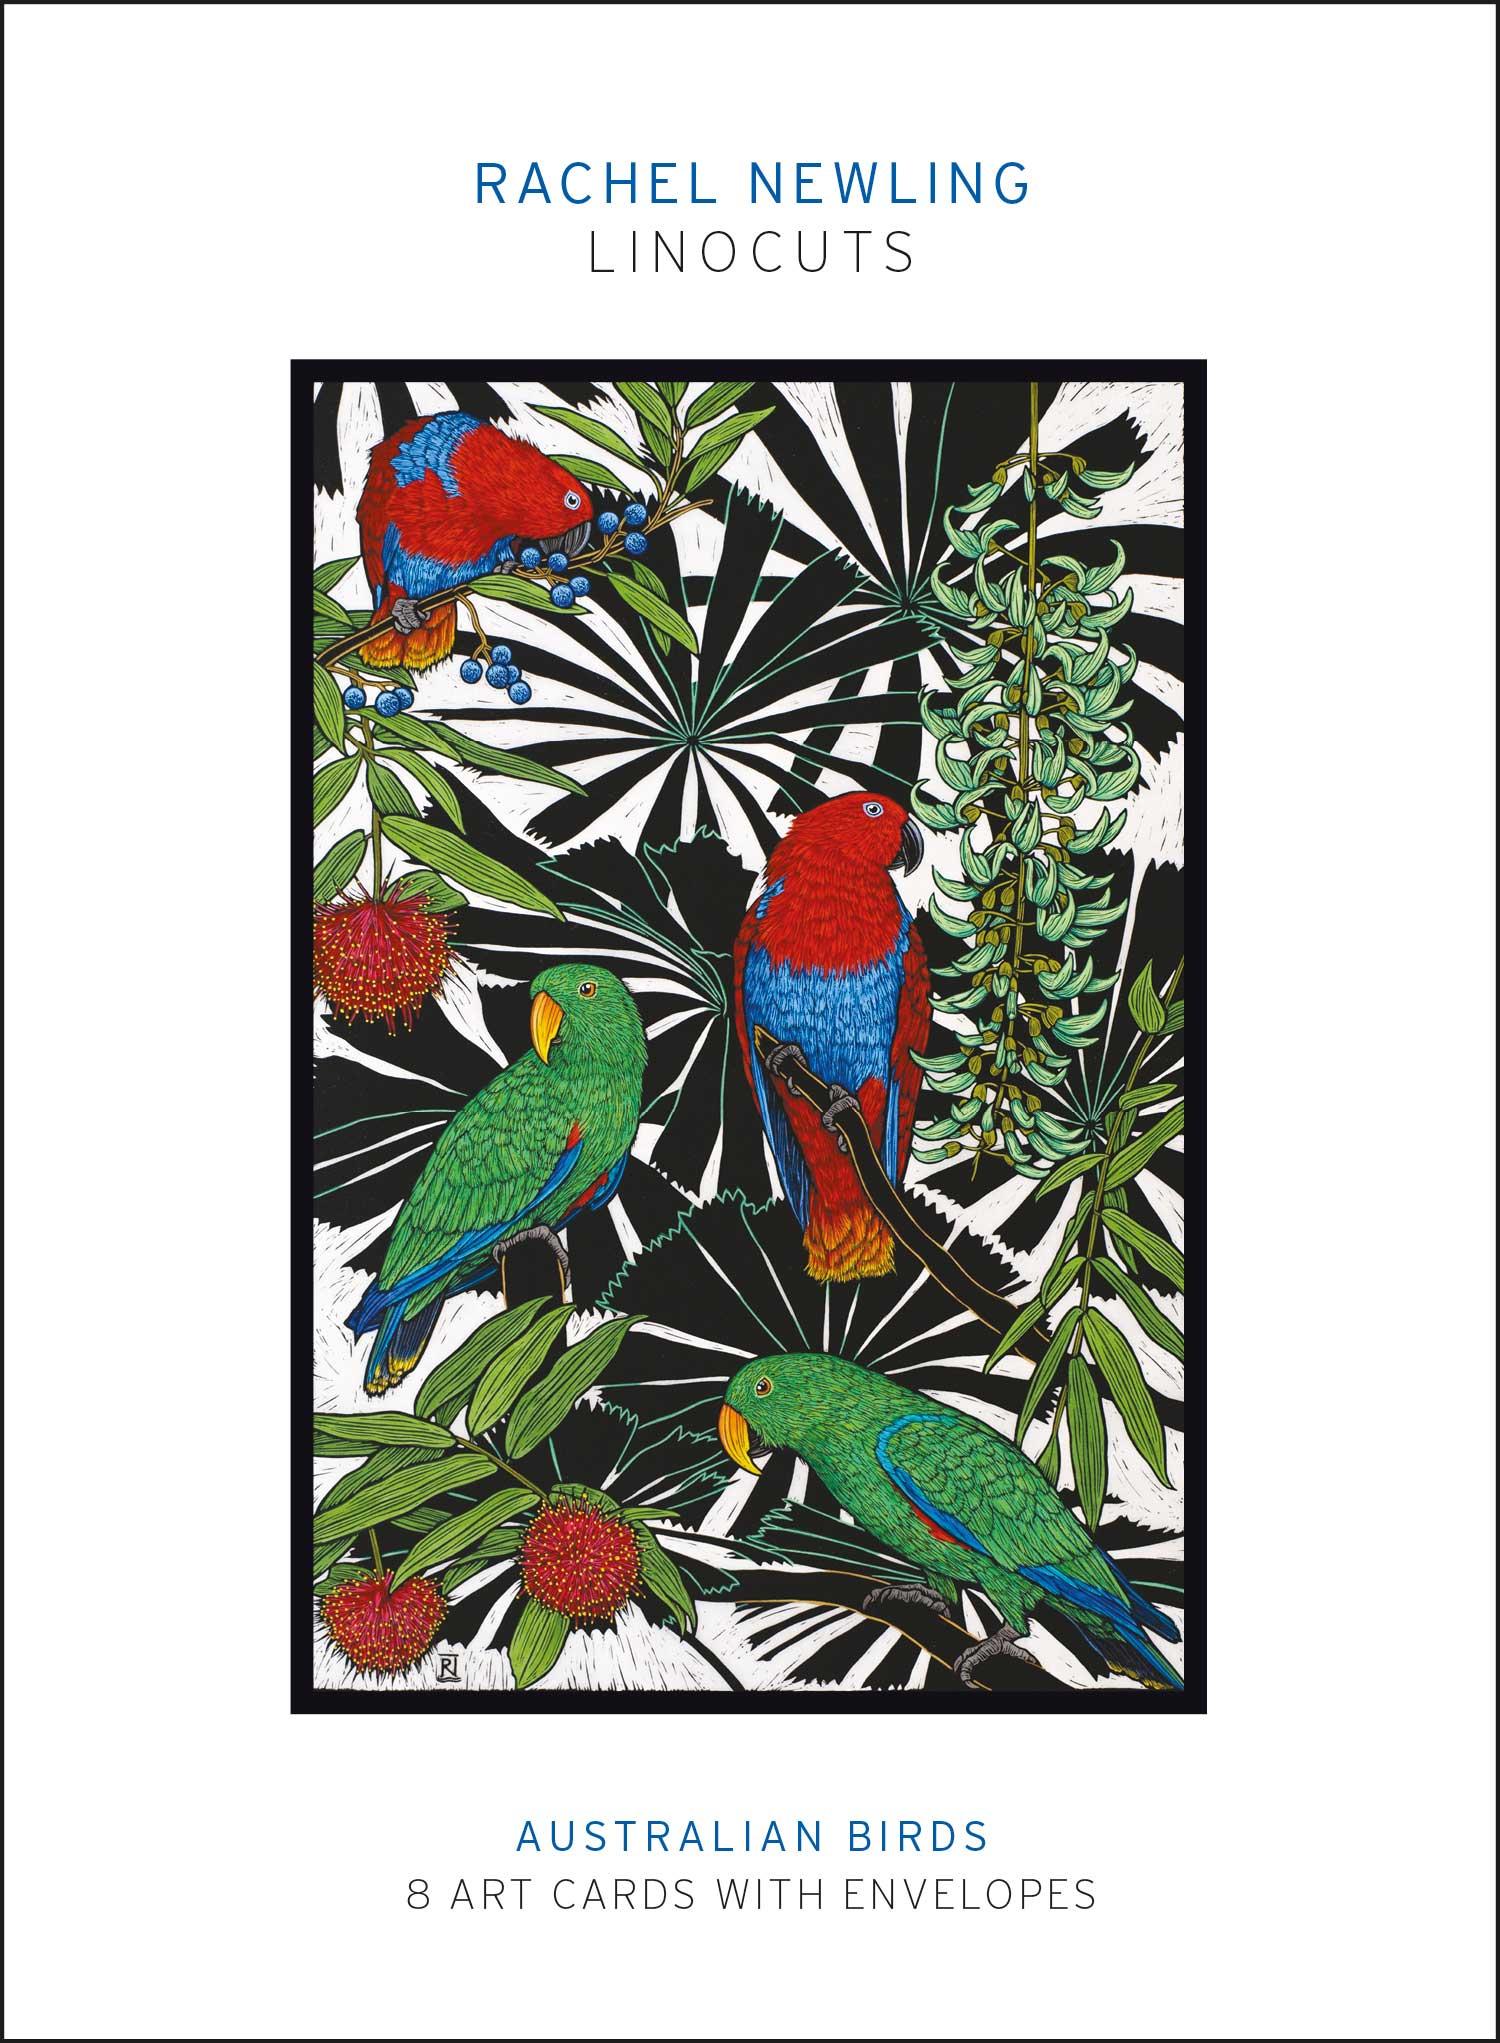 Australian Birds linocuts pack